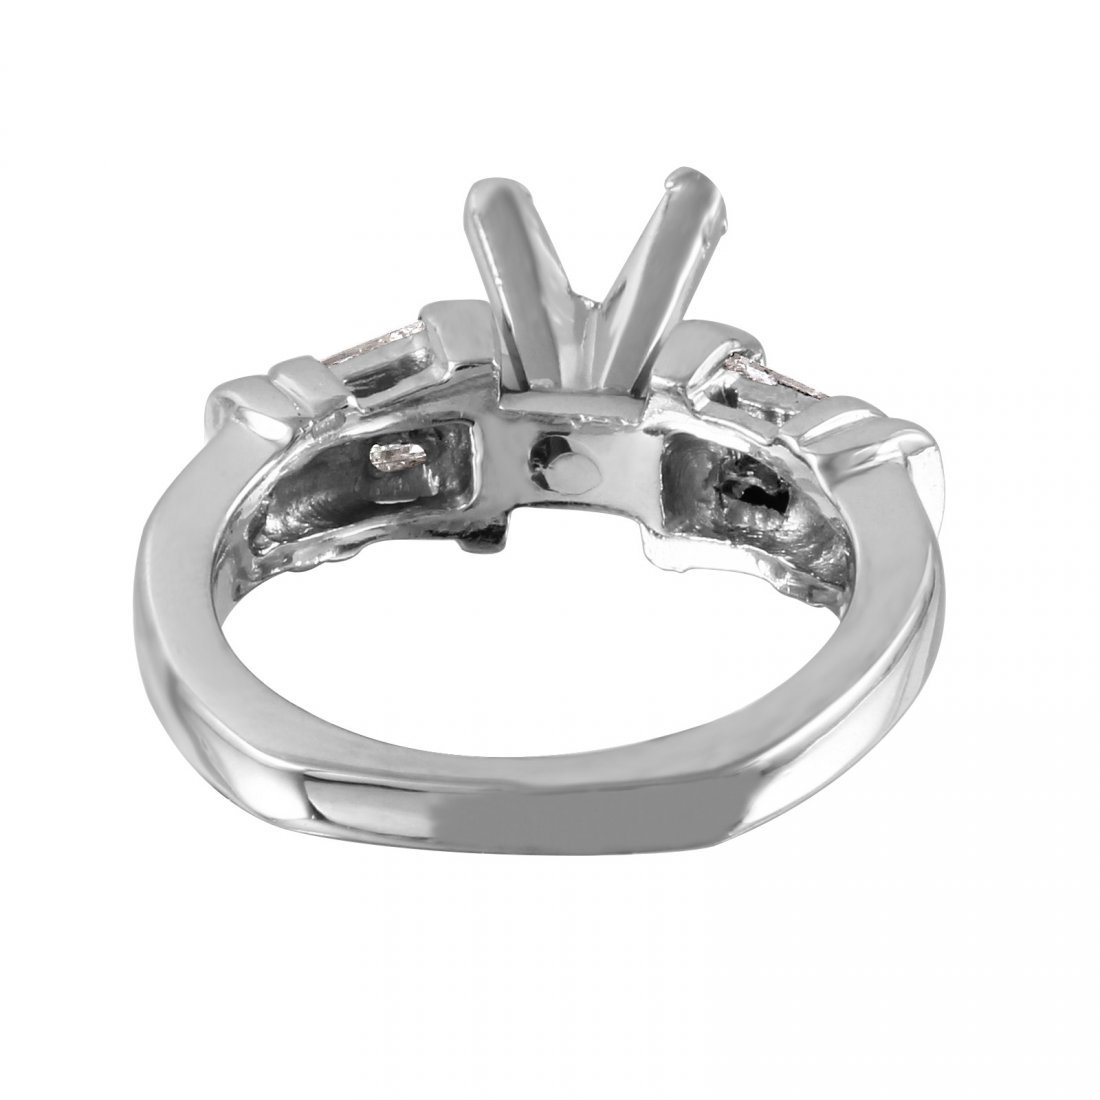 Platinum Semi-Mounting Mixed Diamond Engagement Ring - 4